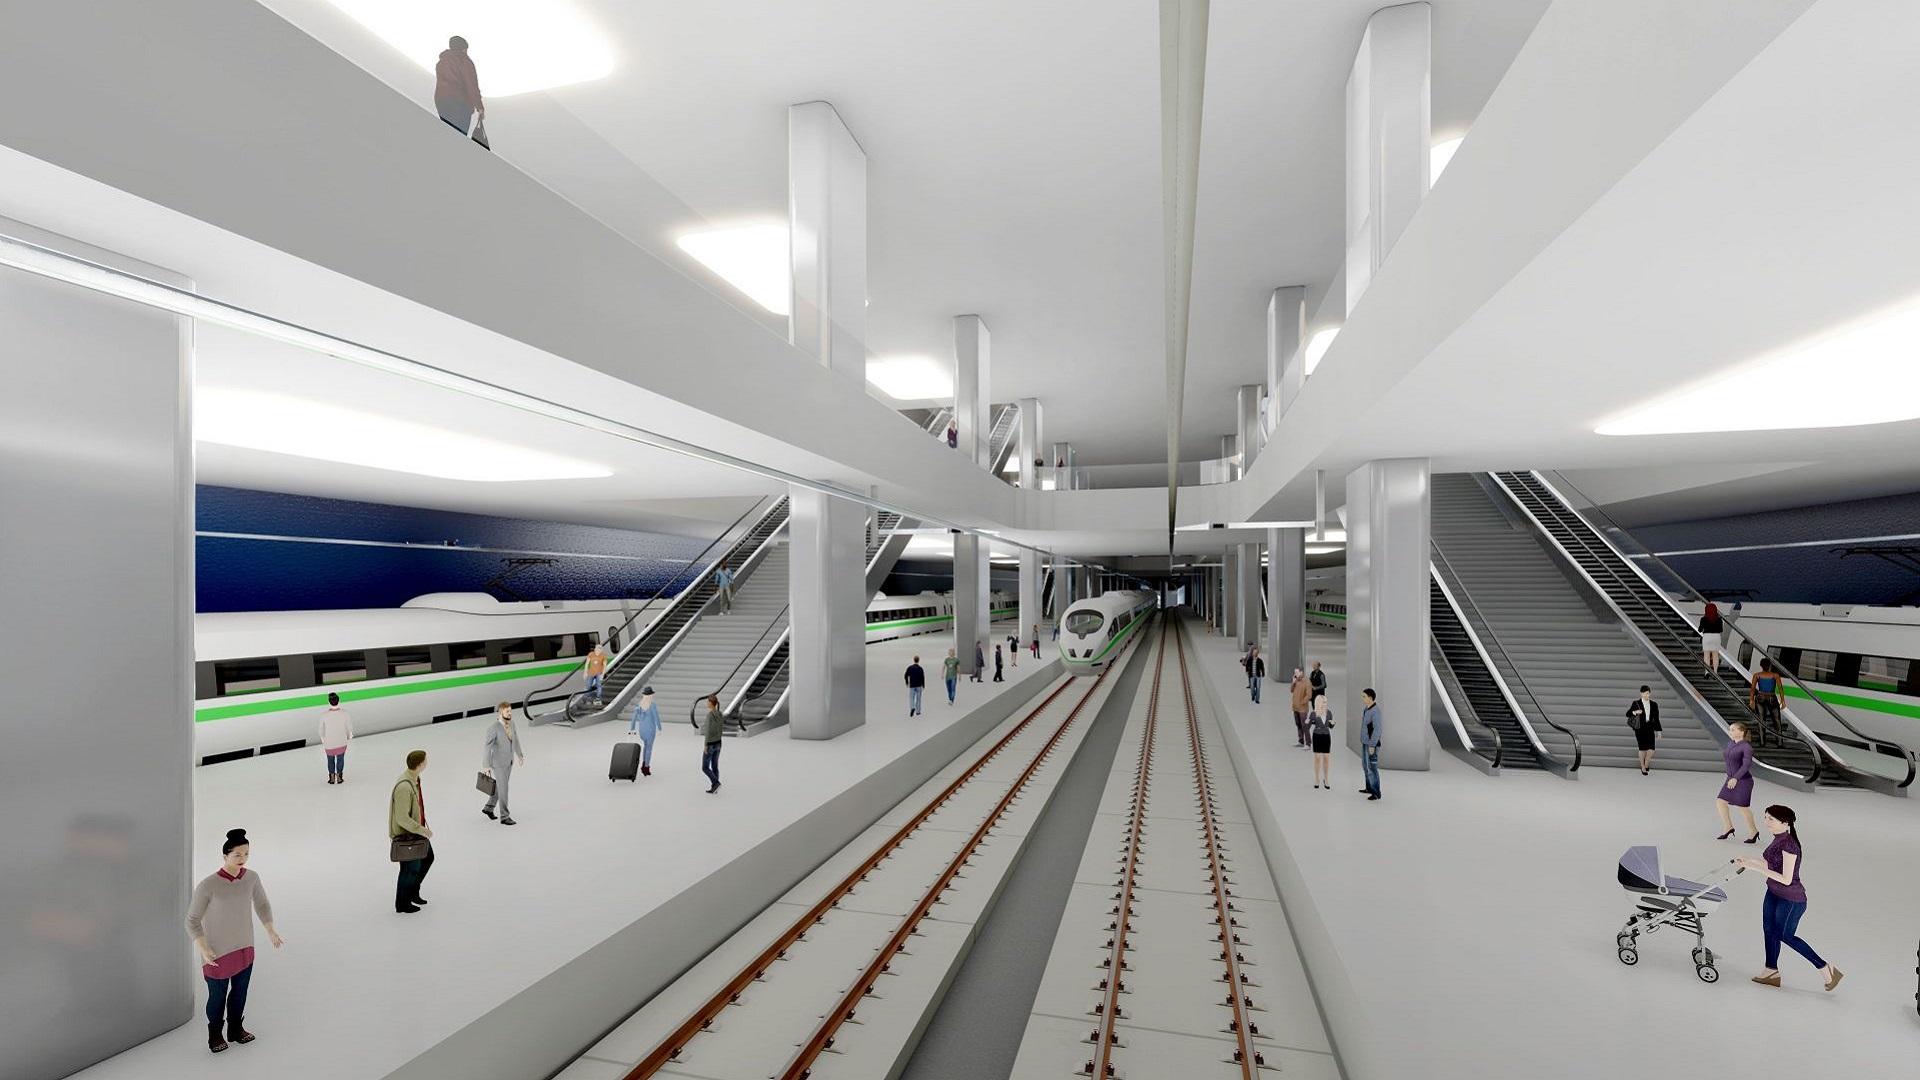 deutschebahn_tiefbahnhof_neu.jpg